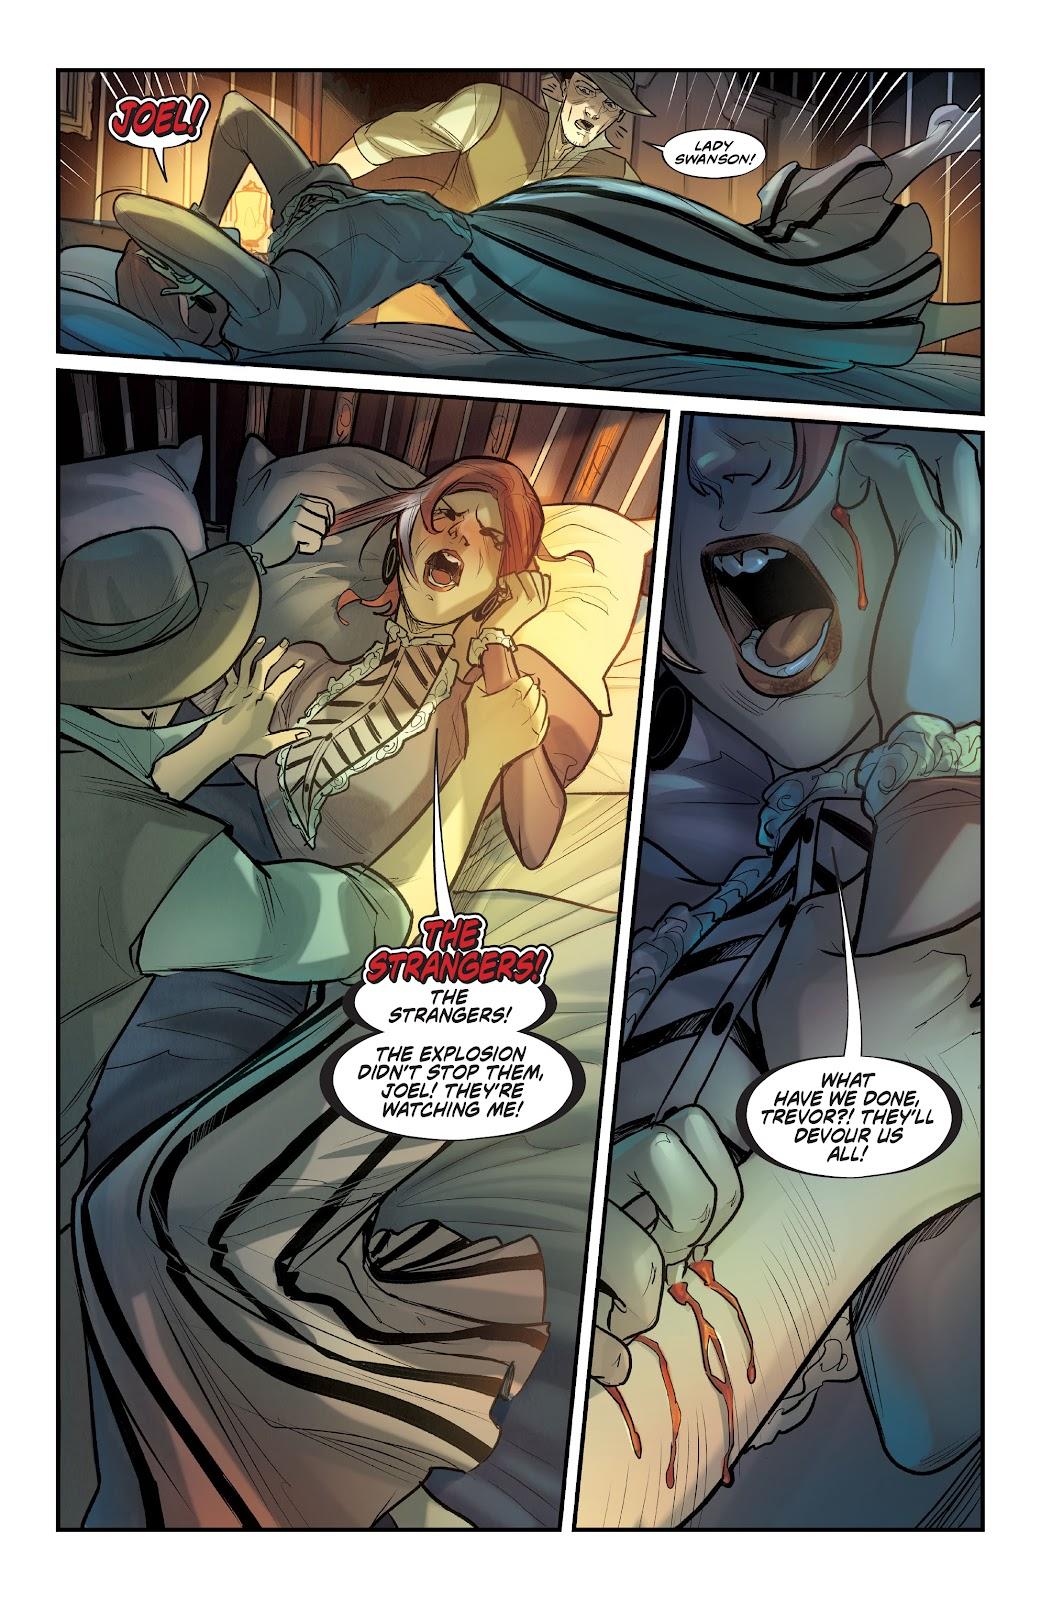 Read online Mirka Andolfo's Mercy comic -  Issue #1 - 24